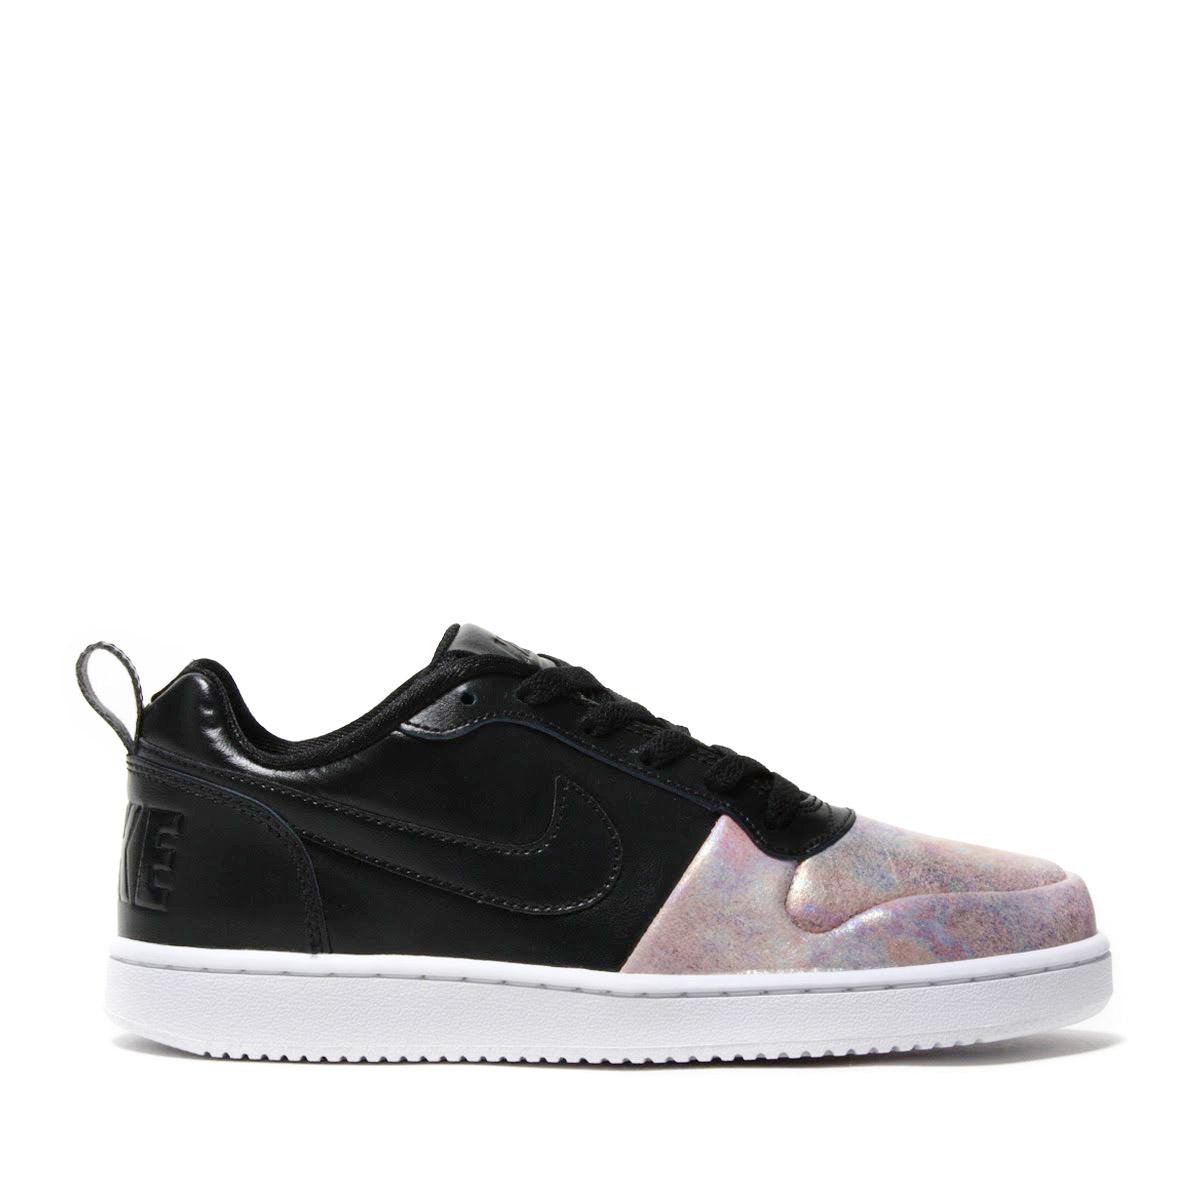 16f52a1ca549 NIKE W COURT BOROUGH LOW PREM (Nike women coat Barlow low premium)  BLACK BLACK-ROSE GOLD-WHITE 17HO-I